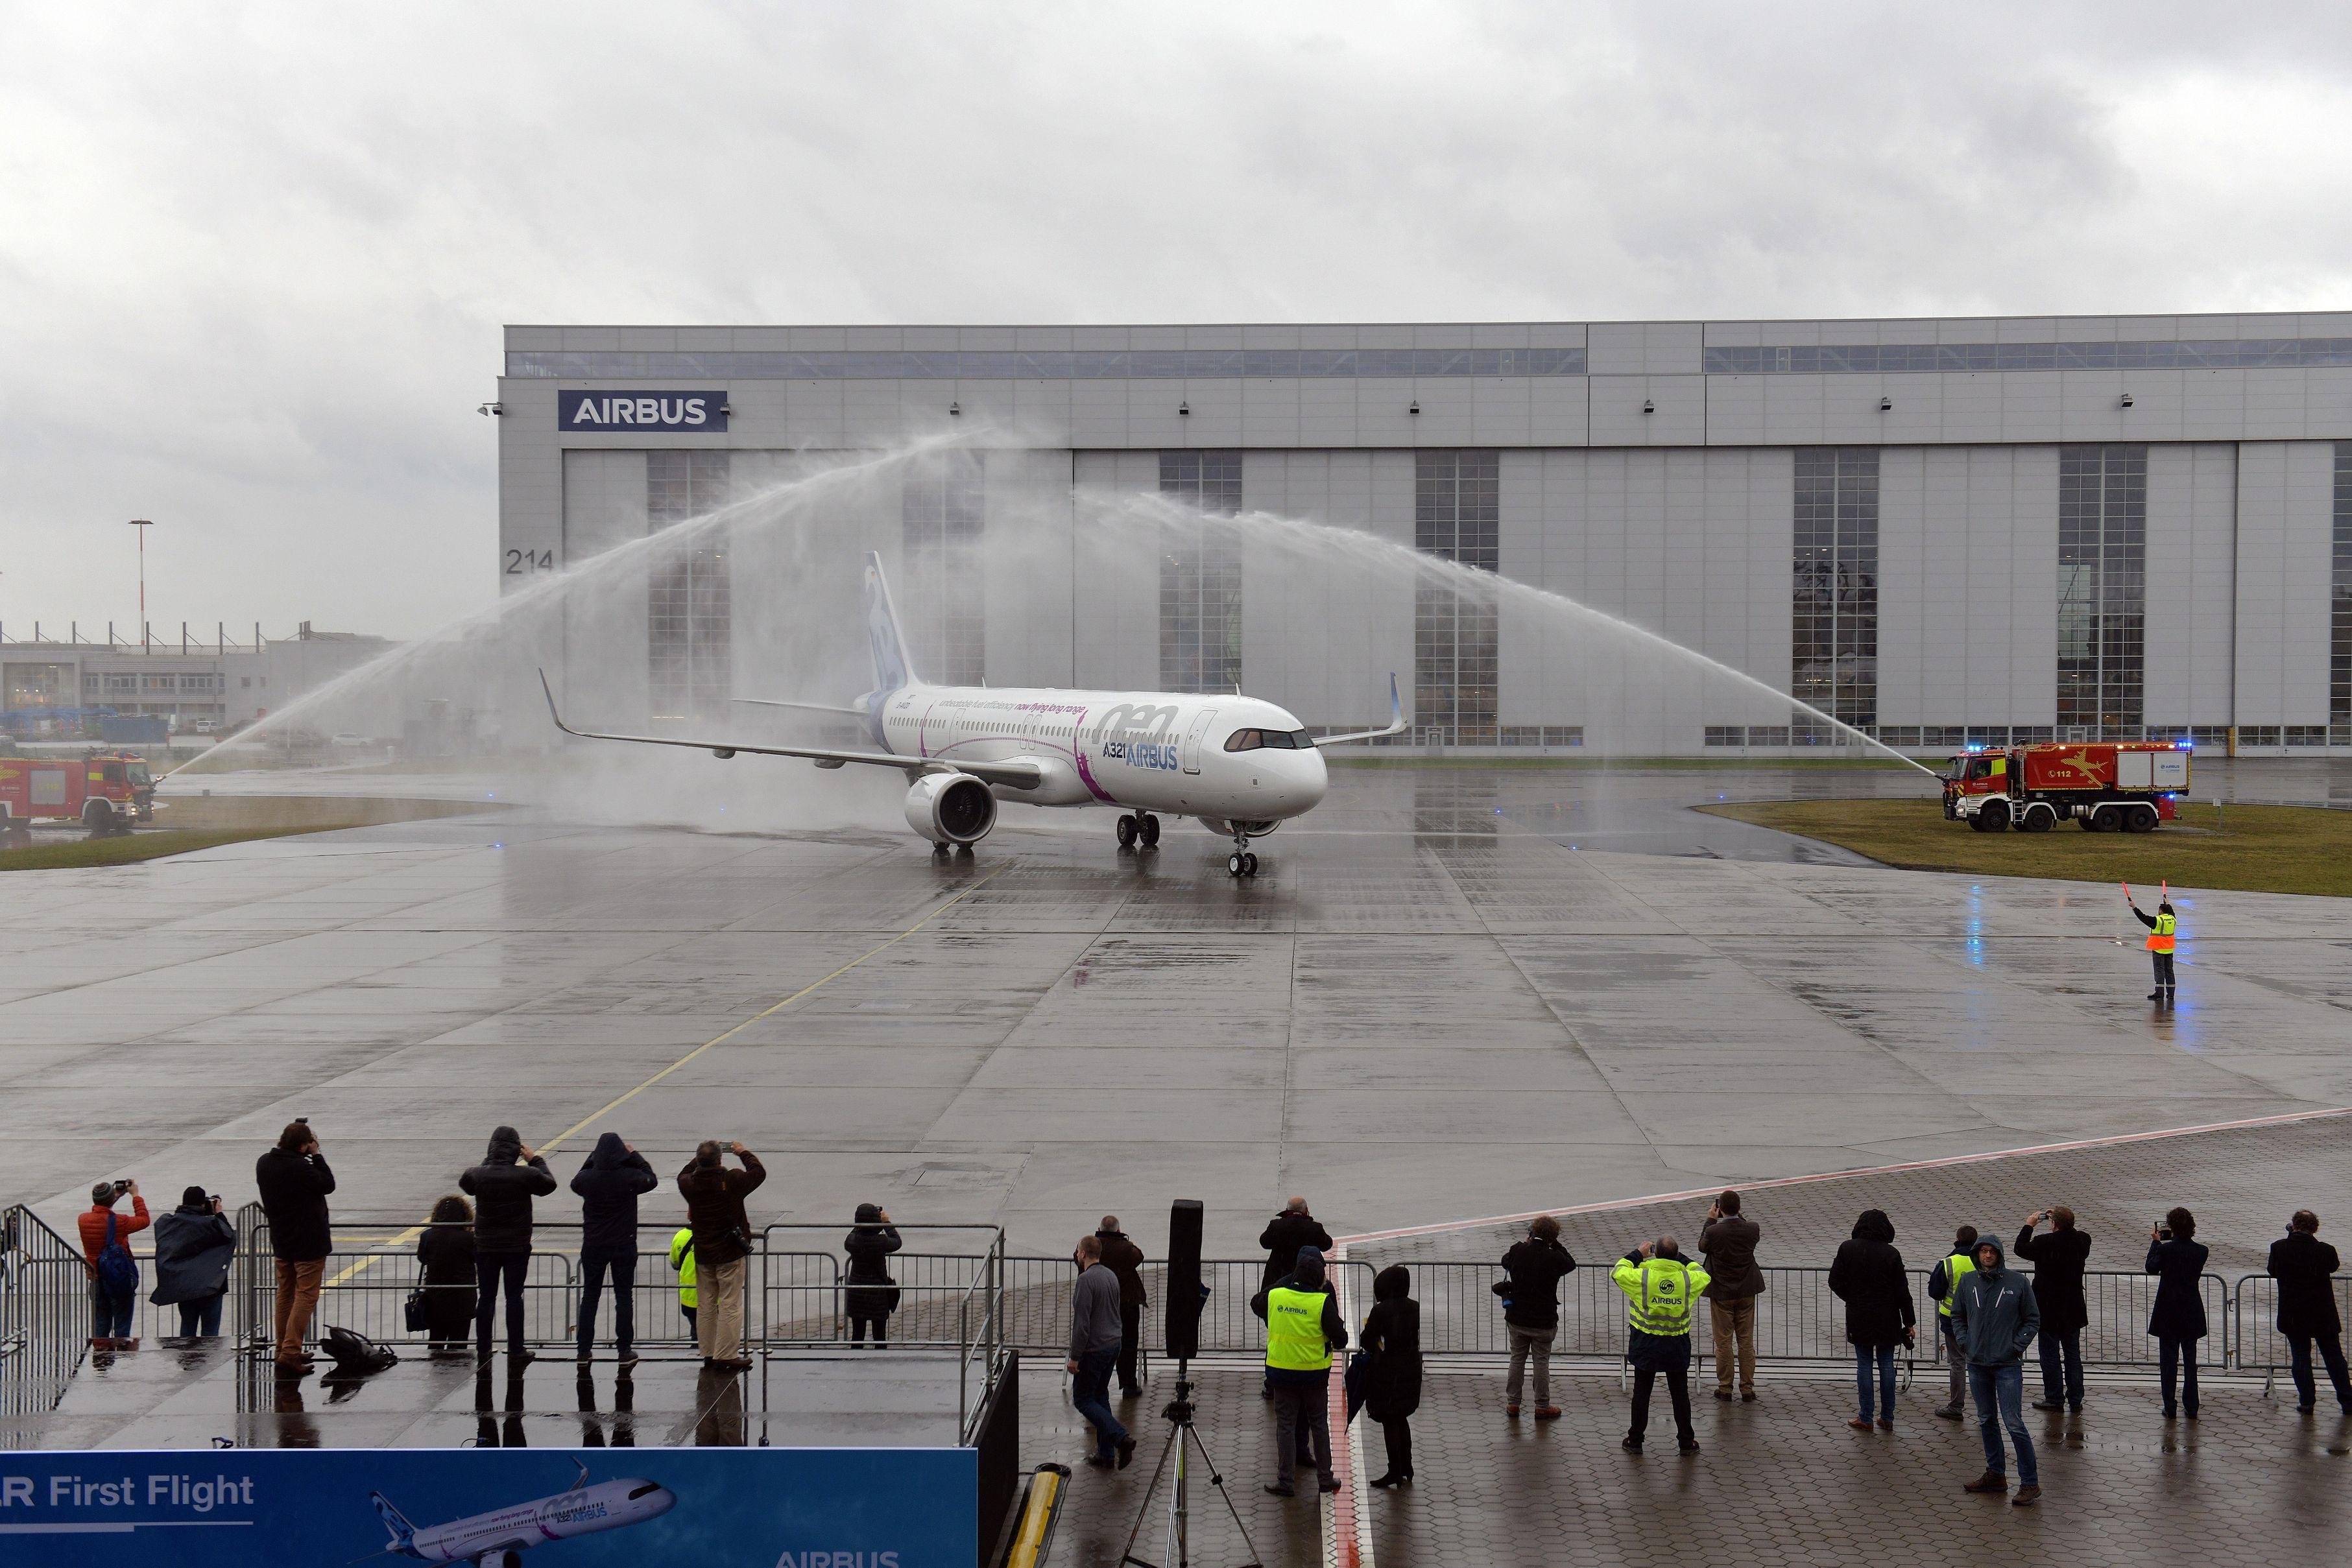 Airbus Soars With Maiden Flight of the Longest-Range Single-Aisle ...